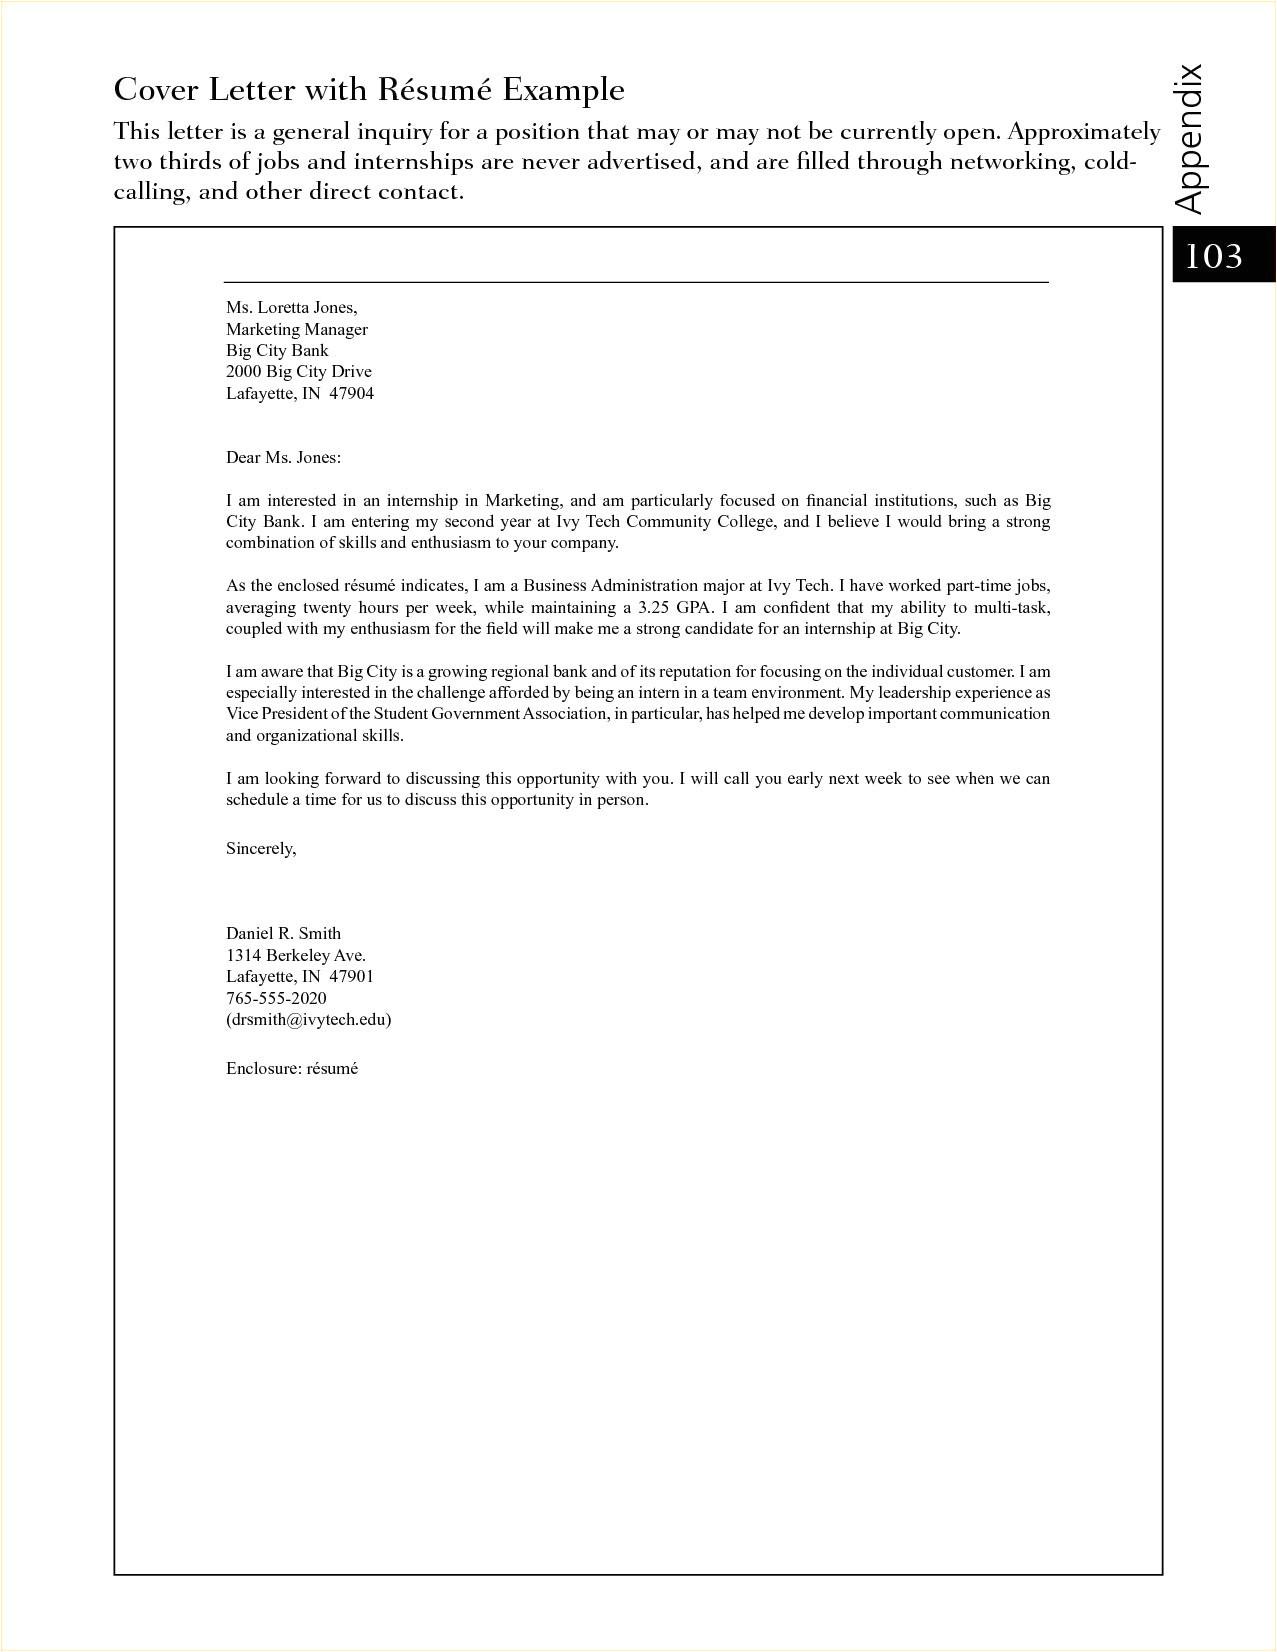 proper closing salutation for cover letter